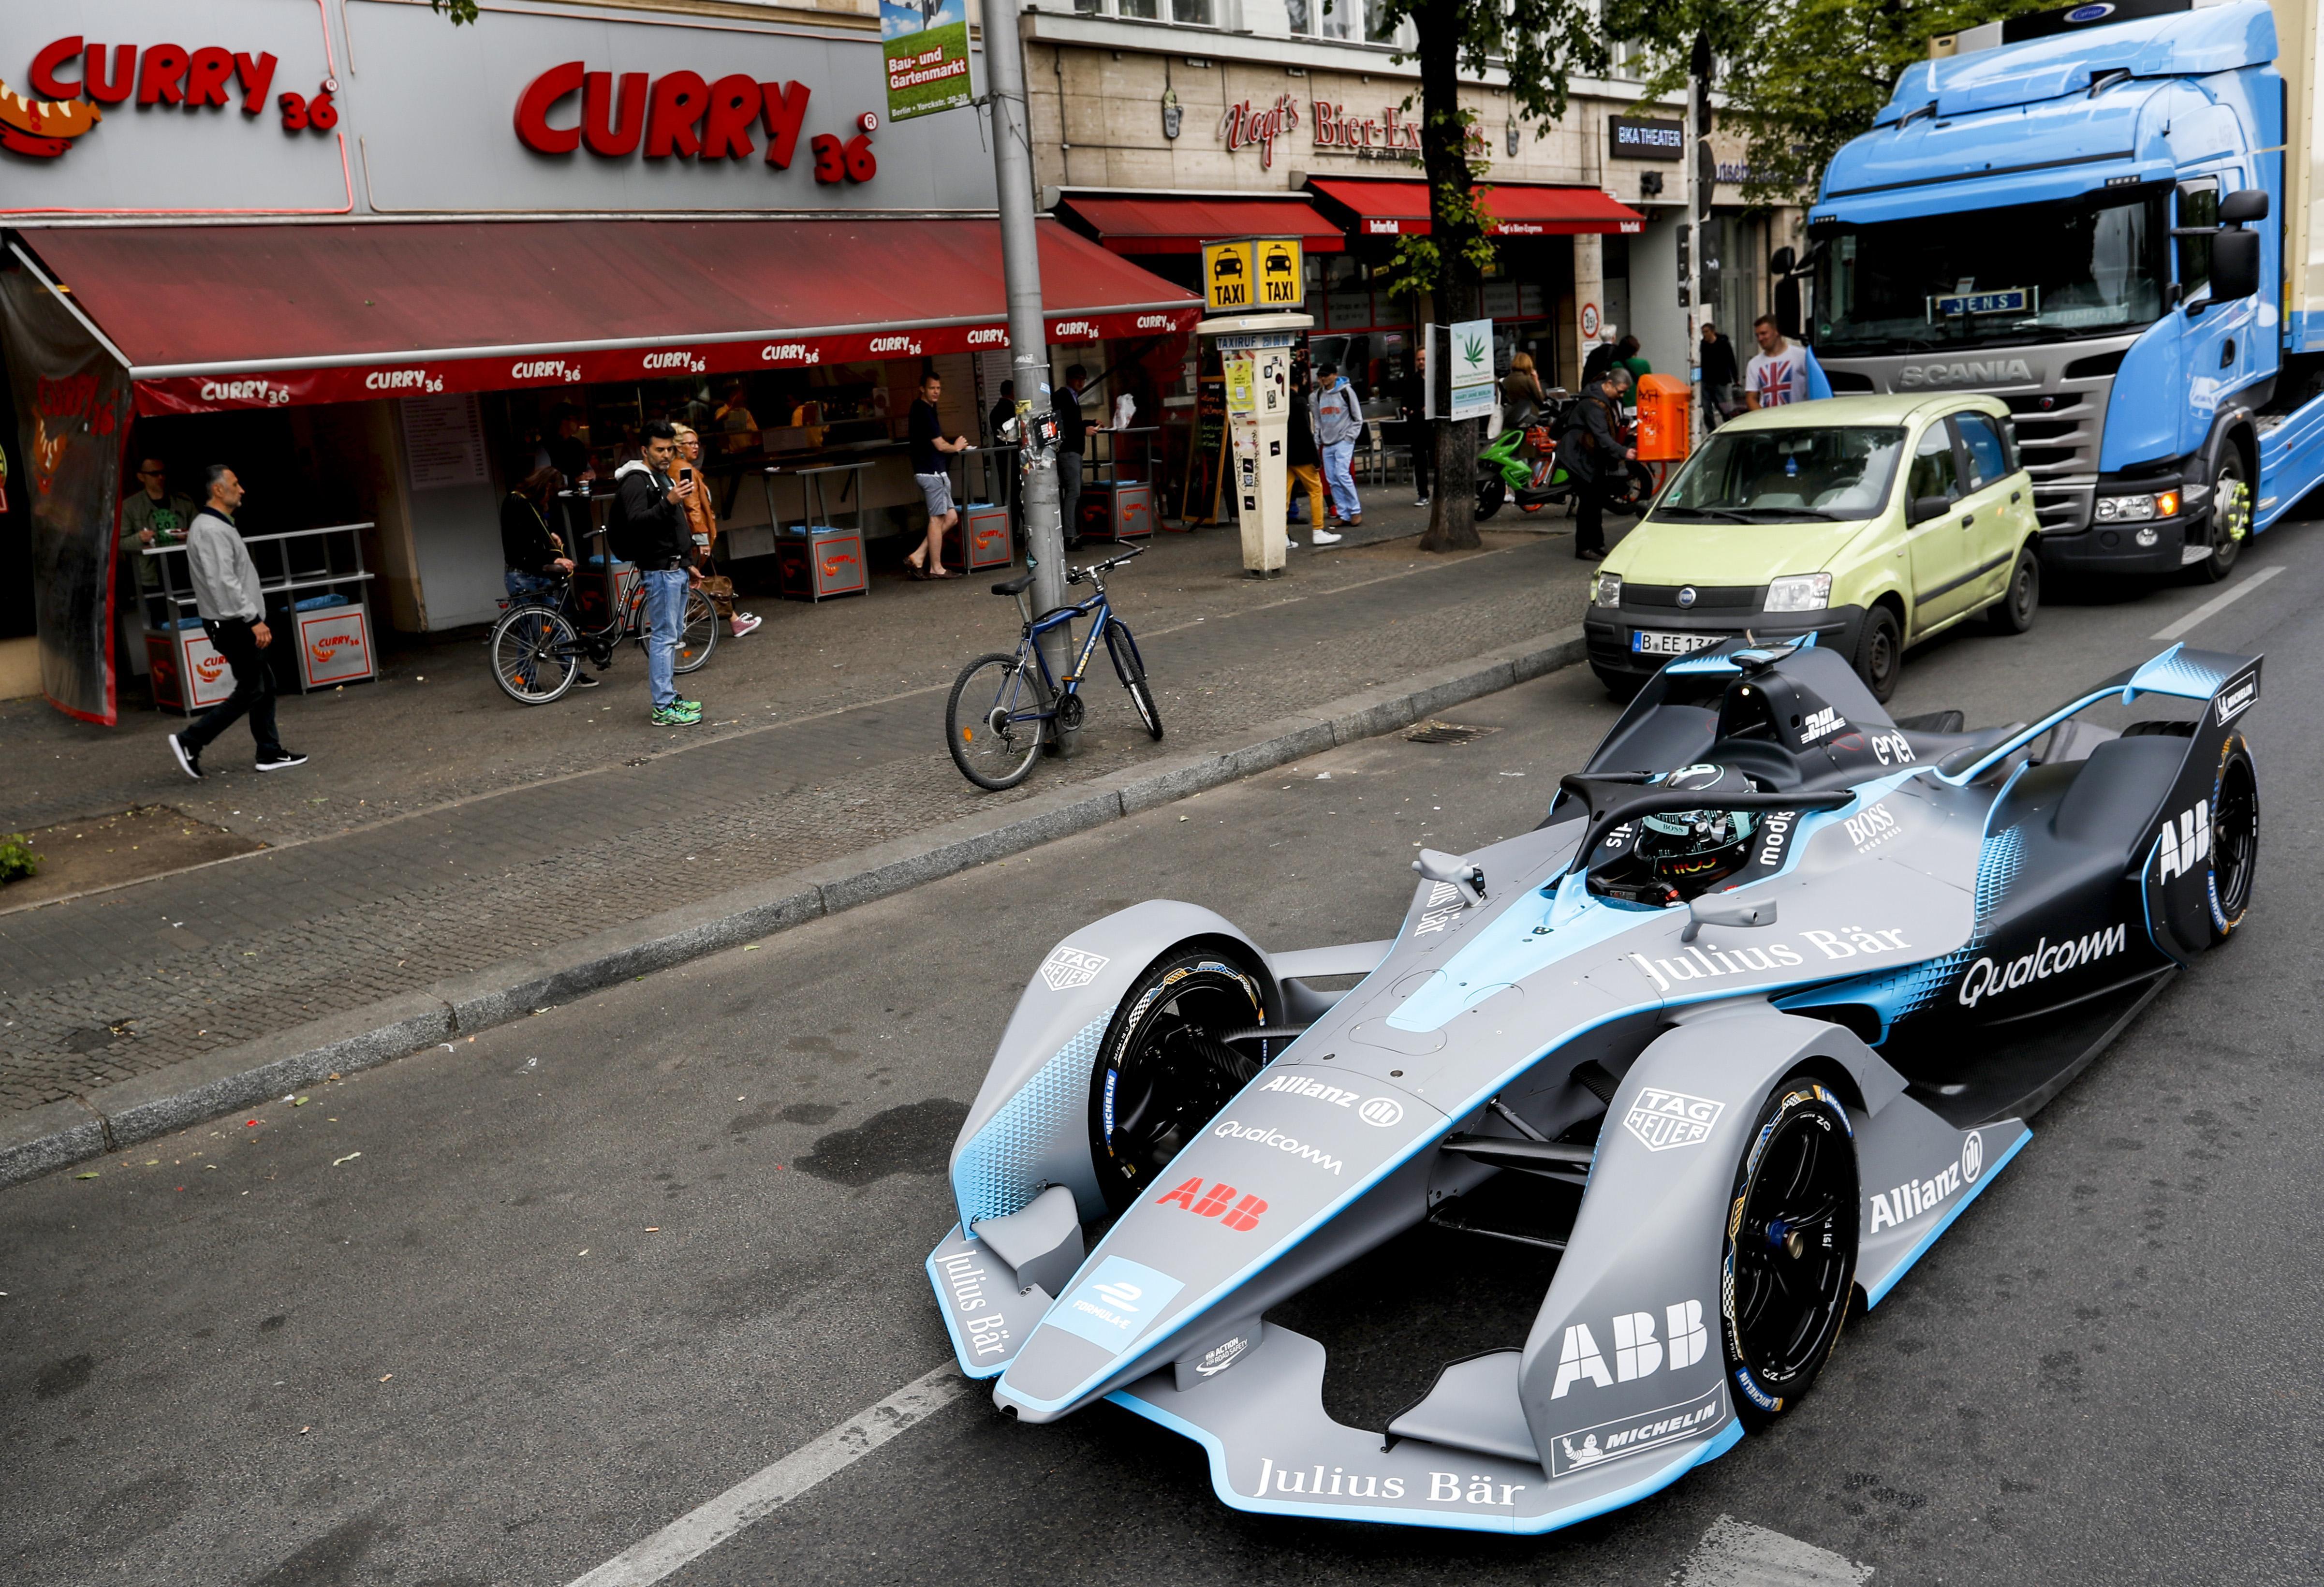 Here is Nico Rosberg driving Gen2 car in the streets of Berlin